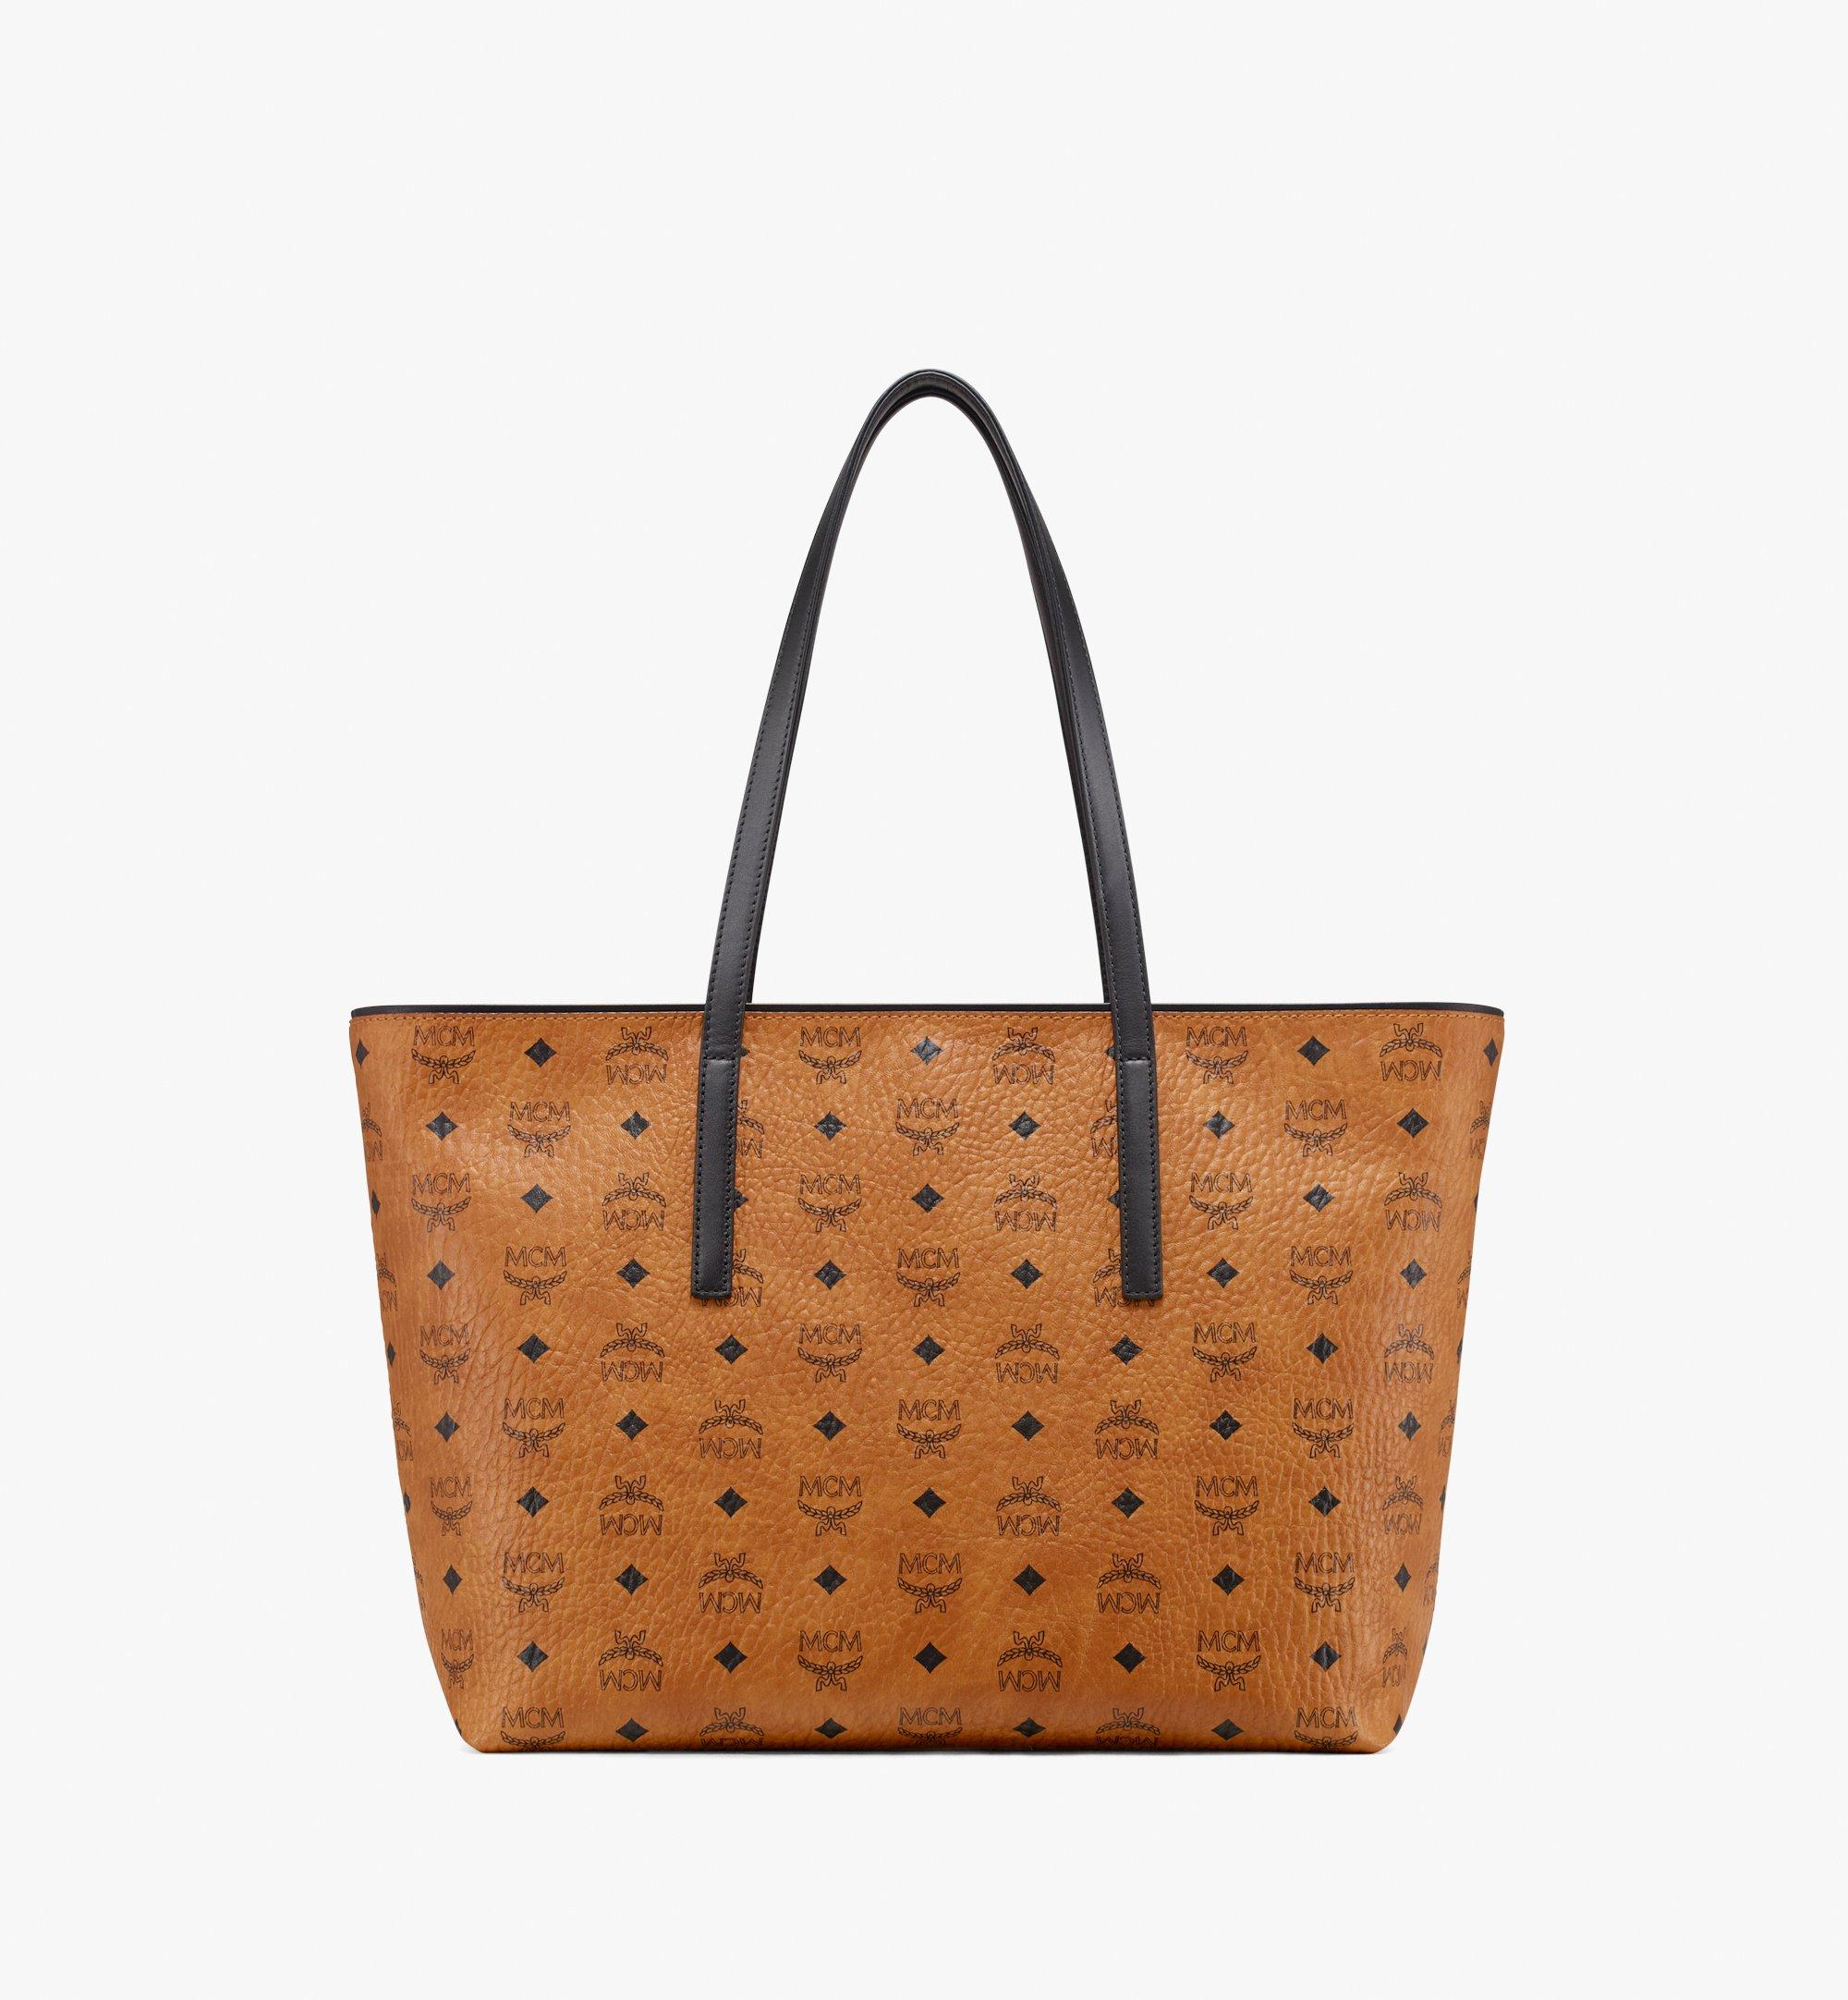 sac cabas cognac fermeture zippée